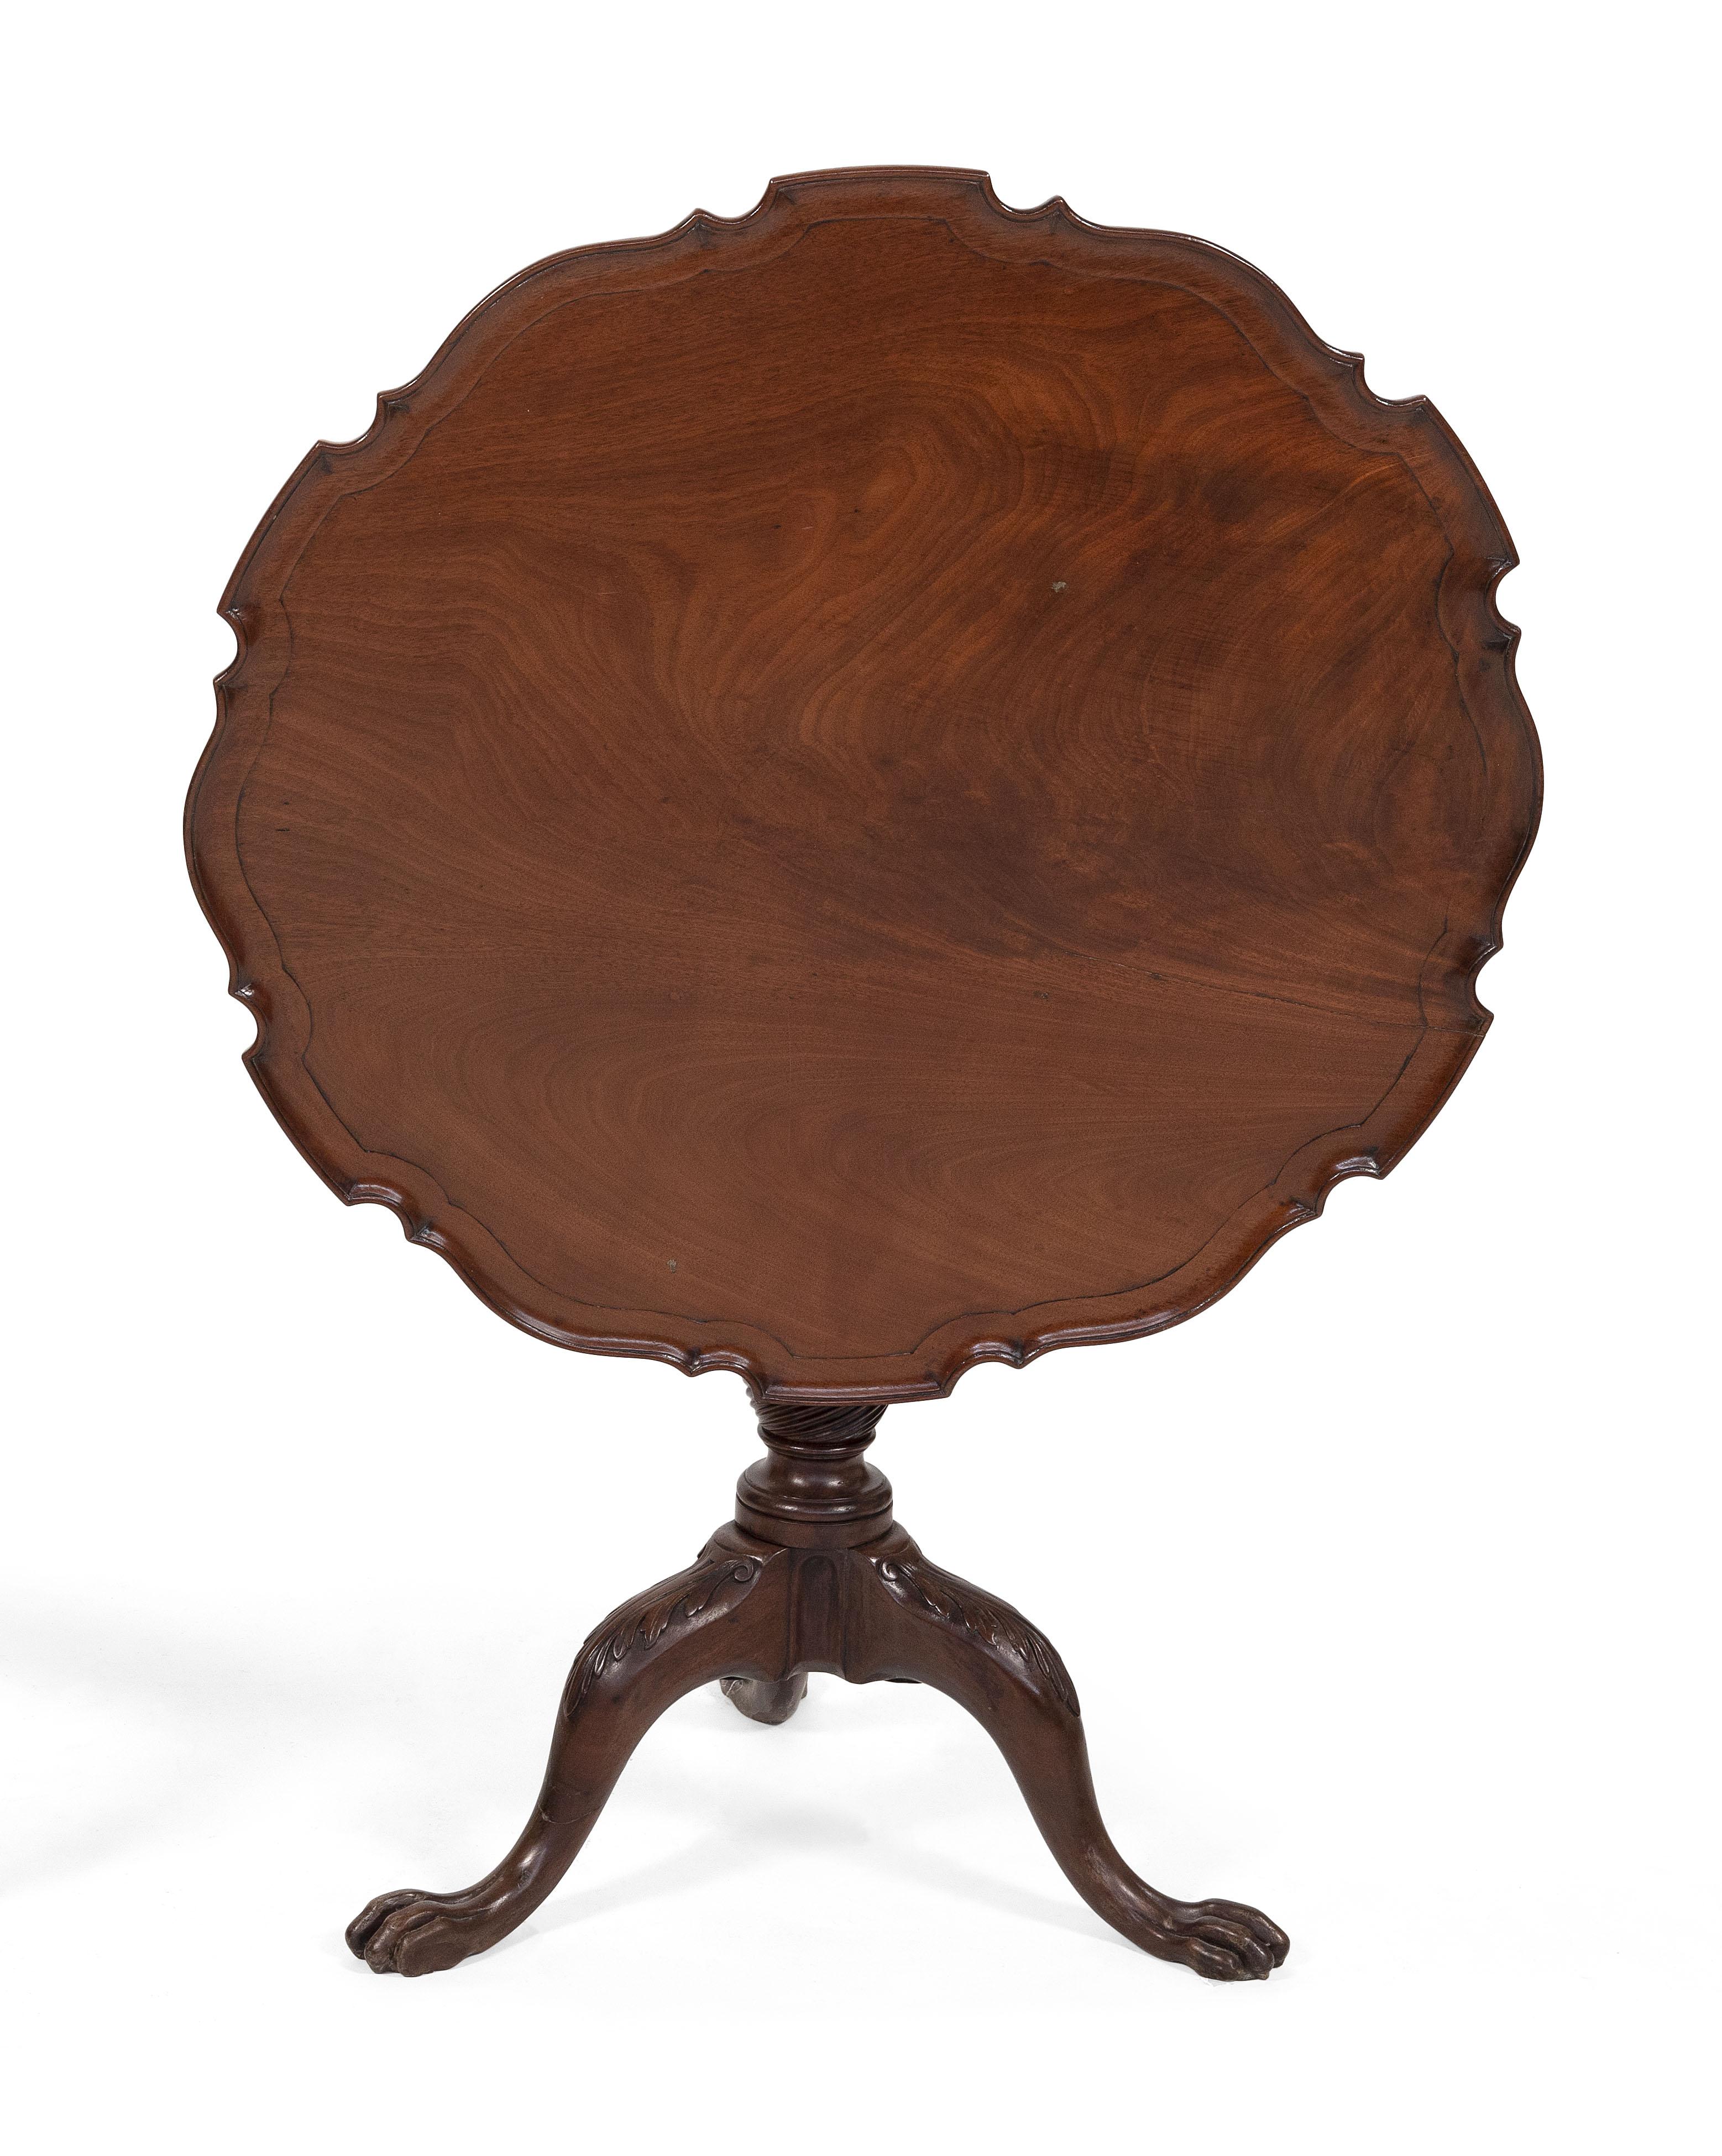 CHIPPENDALE TILT-TOP TEA TABLE Circa 1780 Height 27